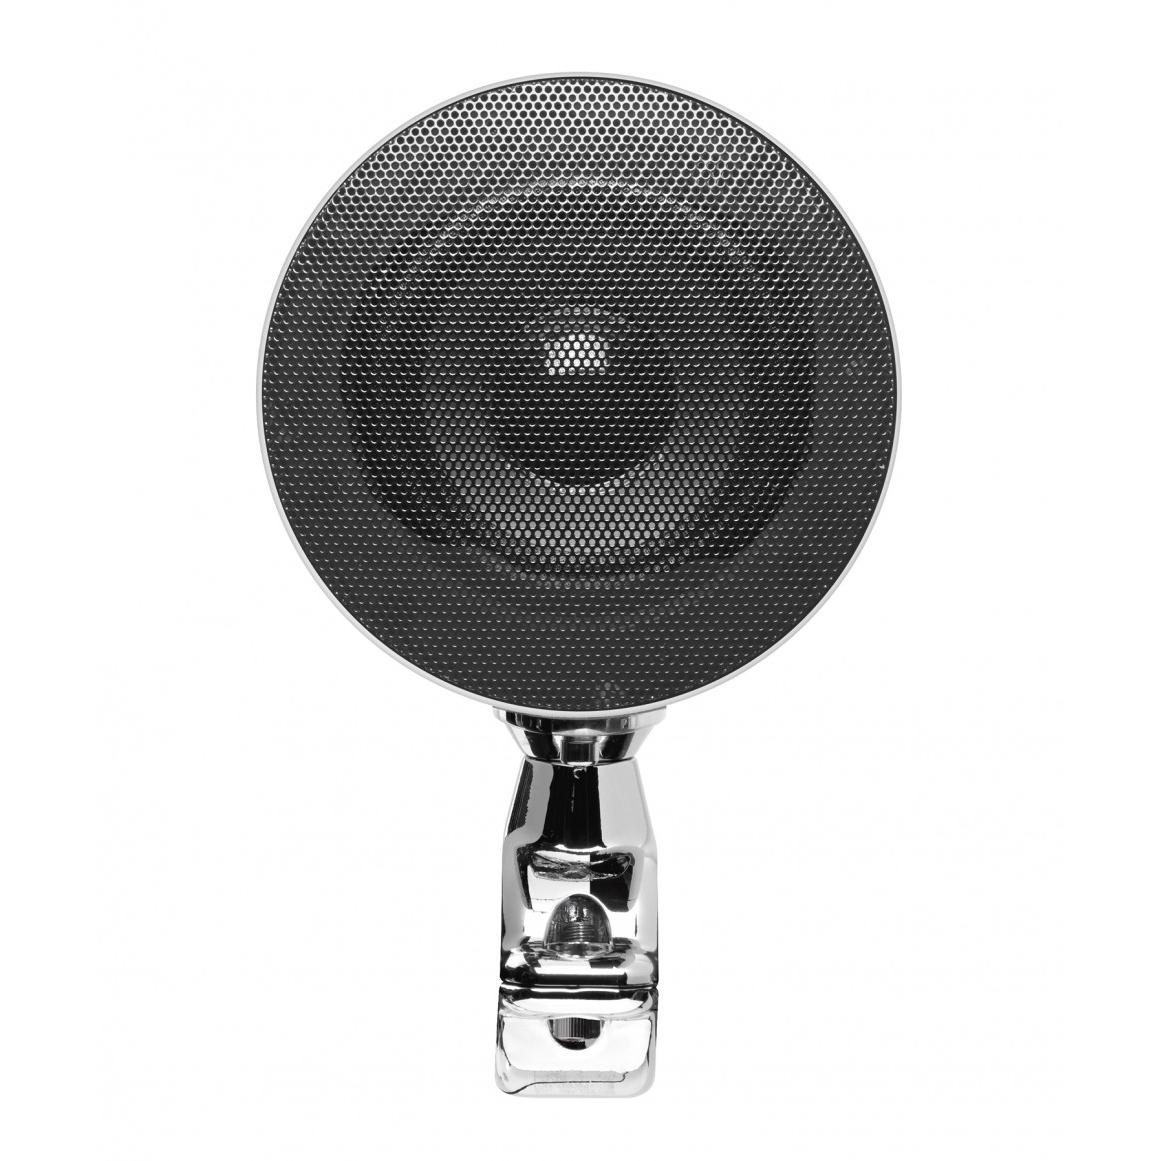 Аудиосистема BOSS AUDIO MC625BA (+ Антисептик-спрей для рук в подарок!)